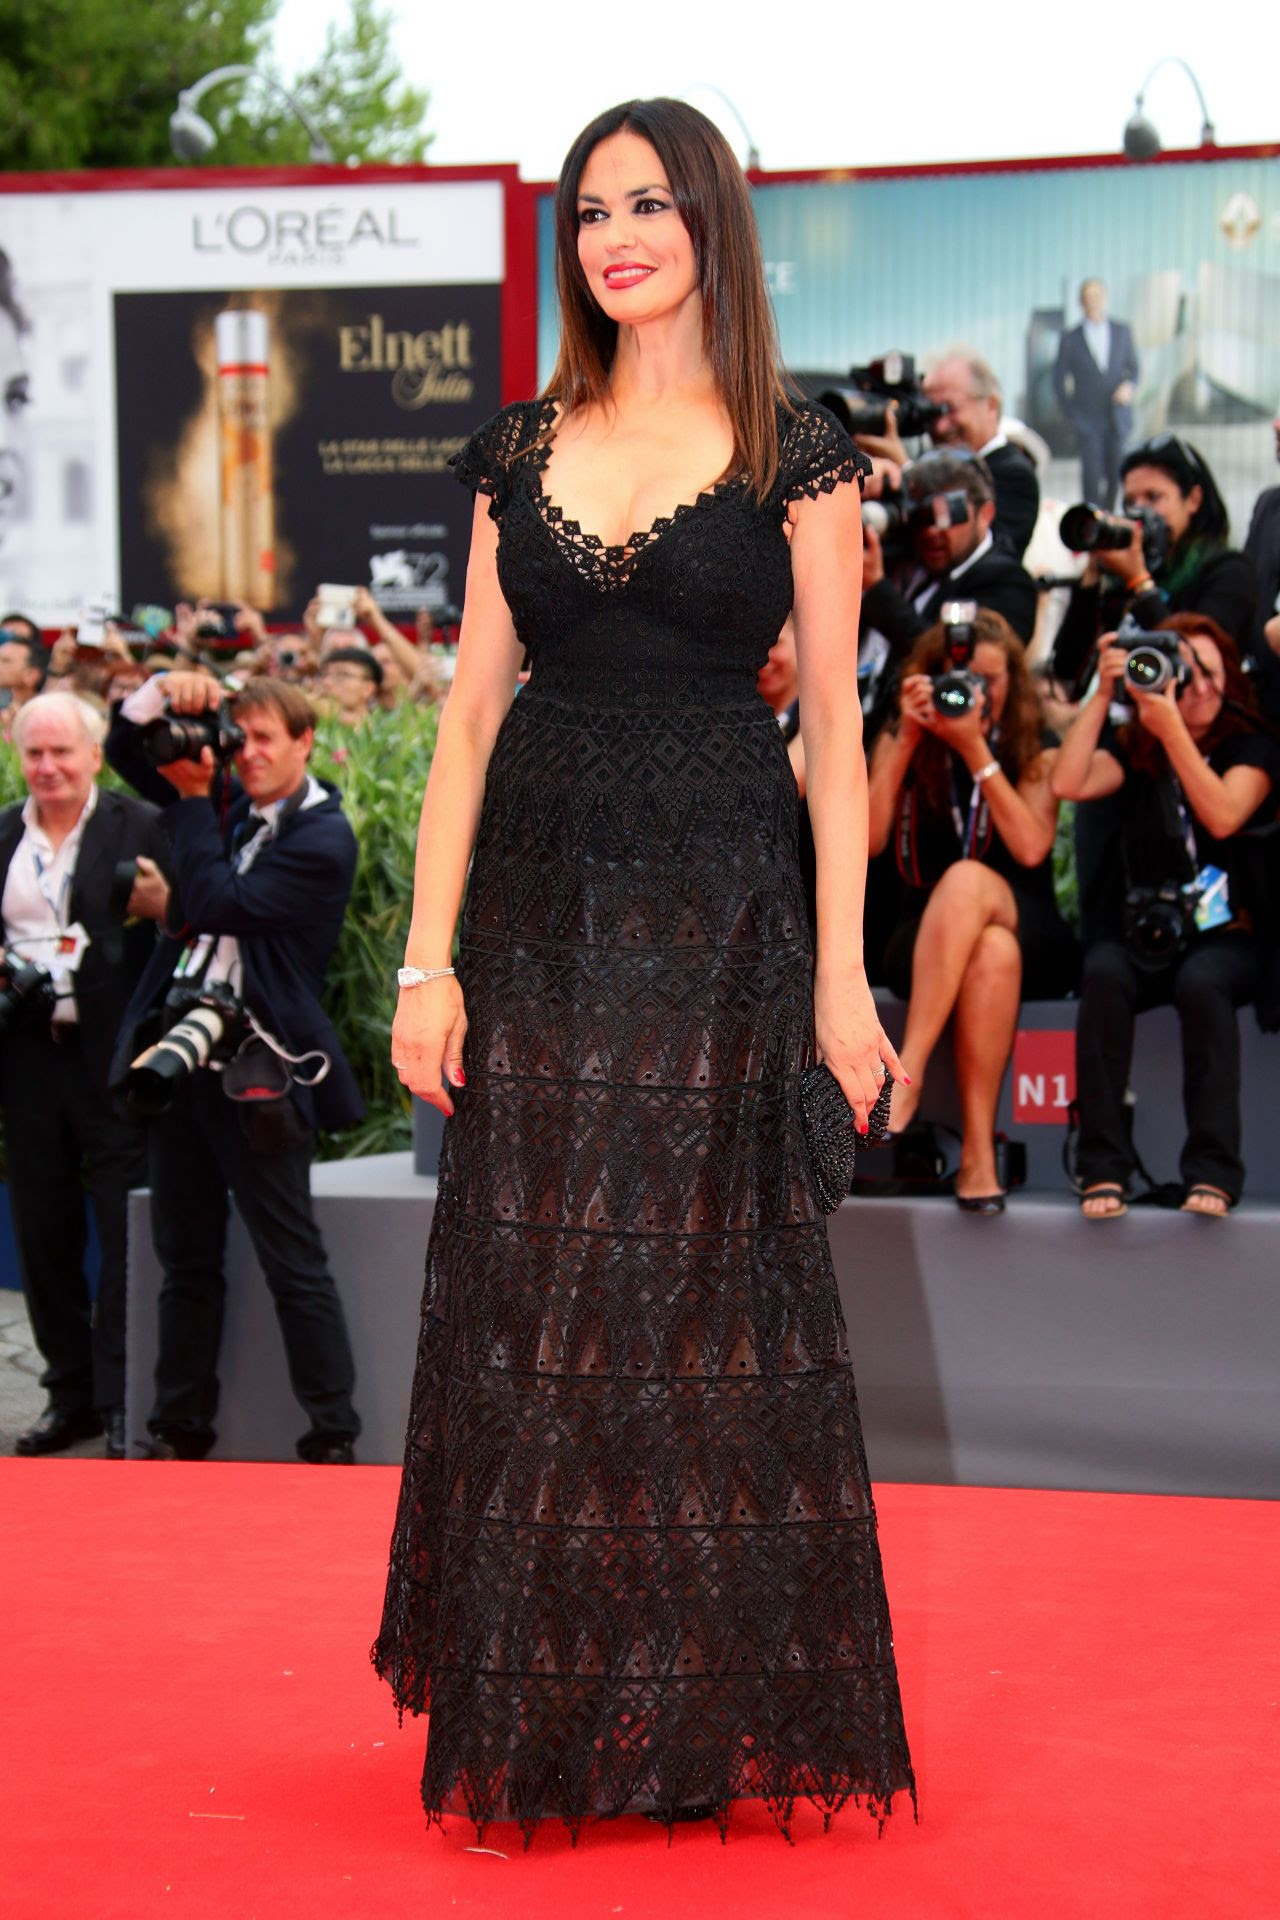 http://celebmafia.com/wp-content/uploads/2015/09/maria-grazia-cucinotta-opening-ceremony-and-premiere-of-everest-2015-venice-film-festival_1.jpg